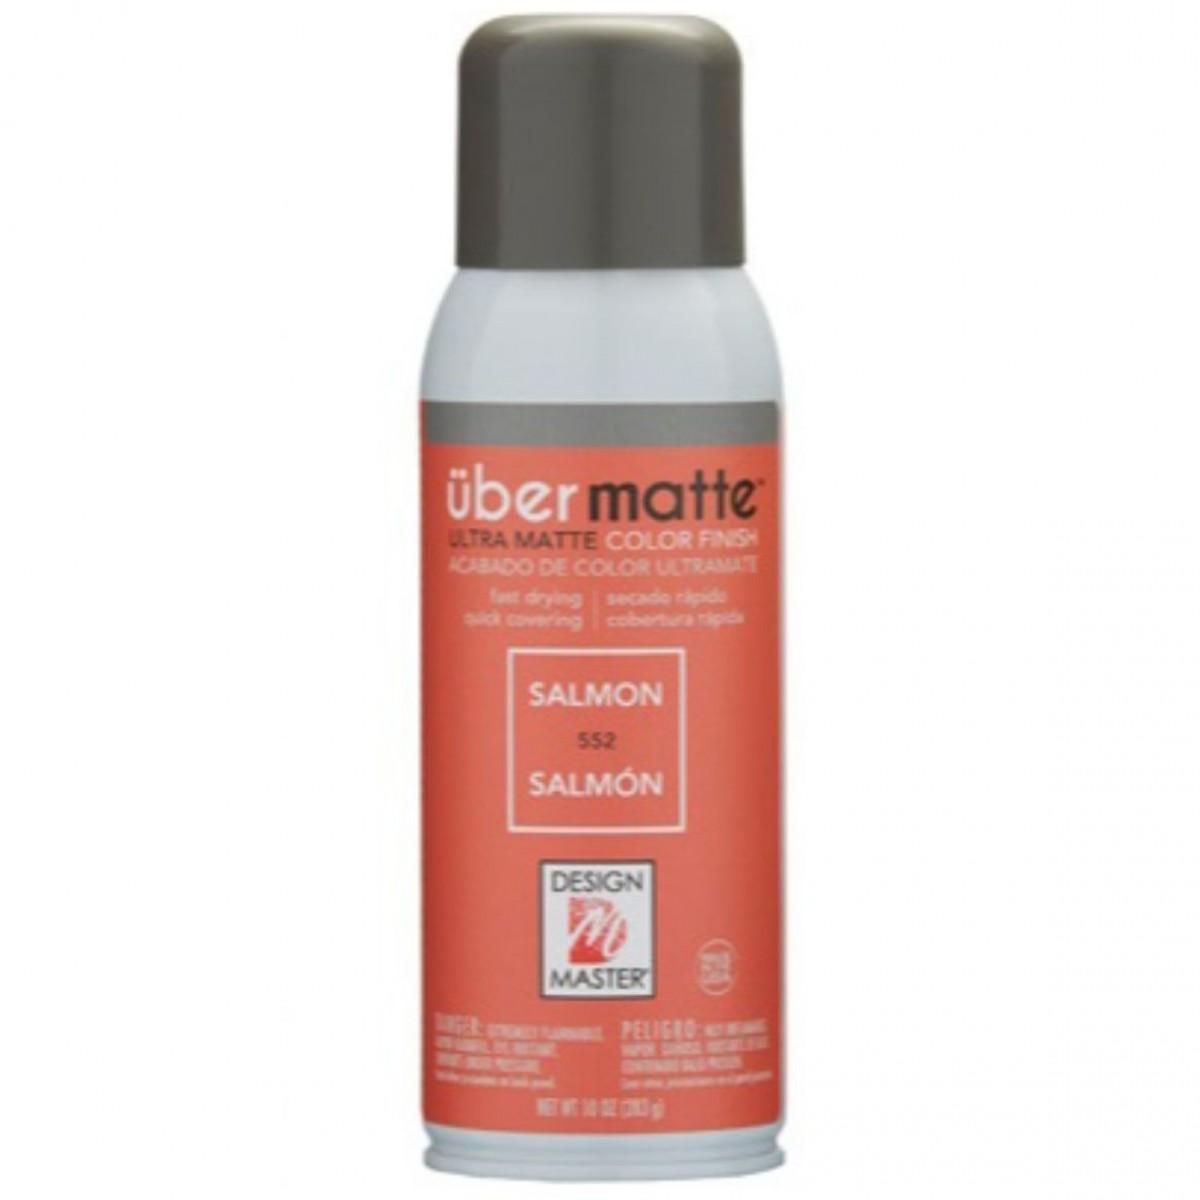 552 Salmon DM Ubermatt Colour Spray Paint - 1 No